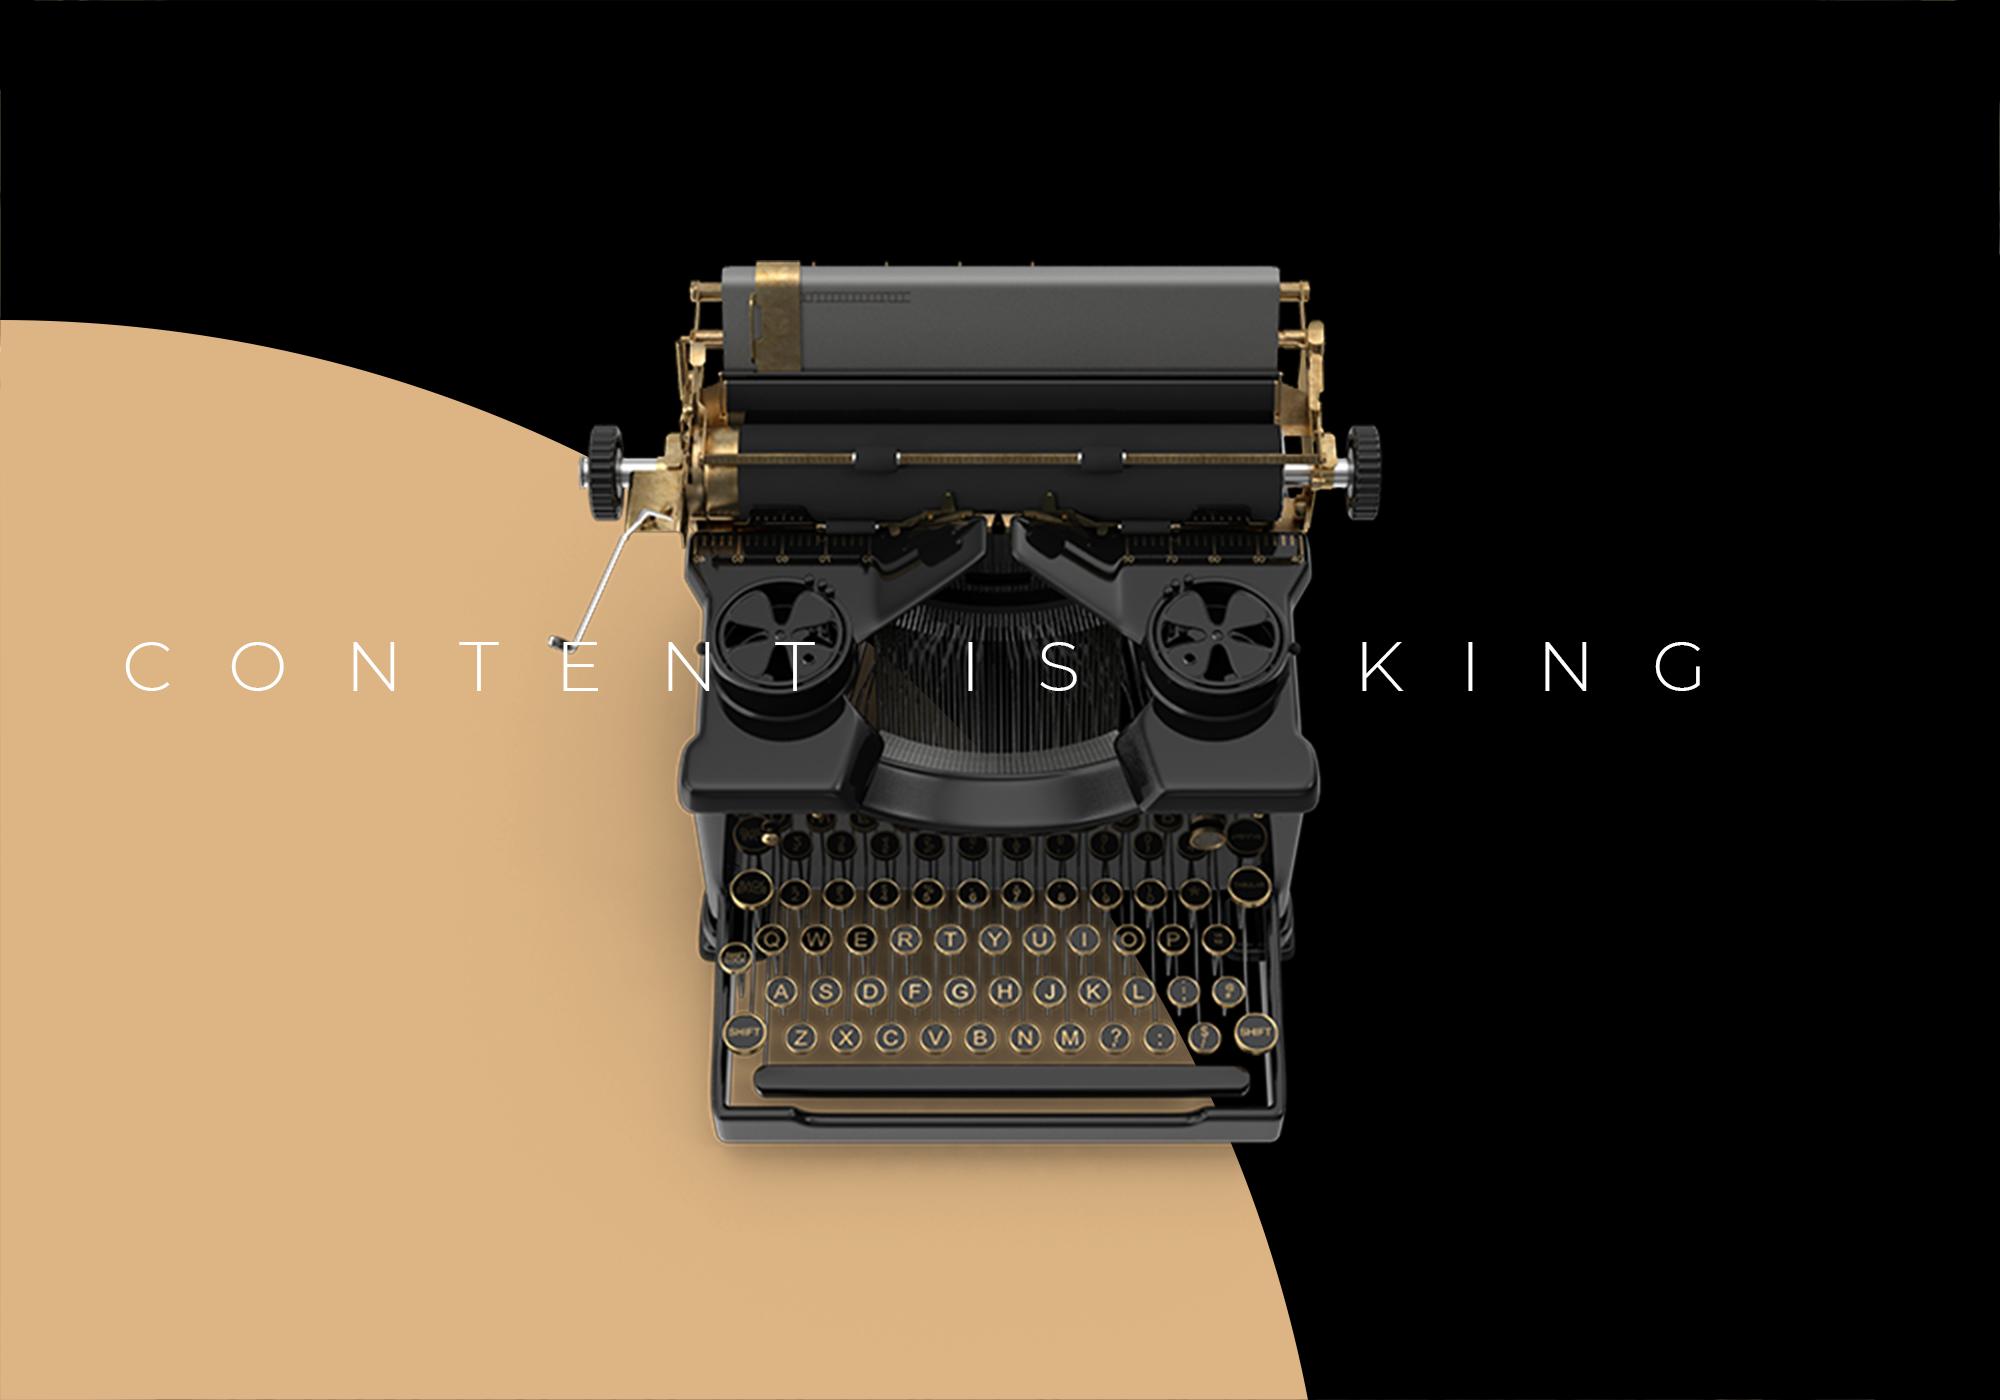 content is king website là gì